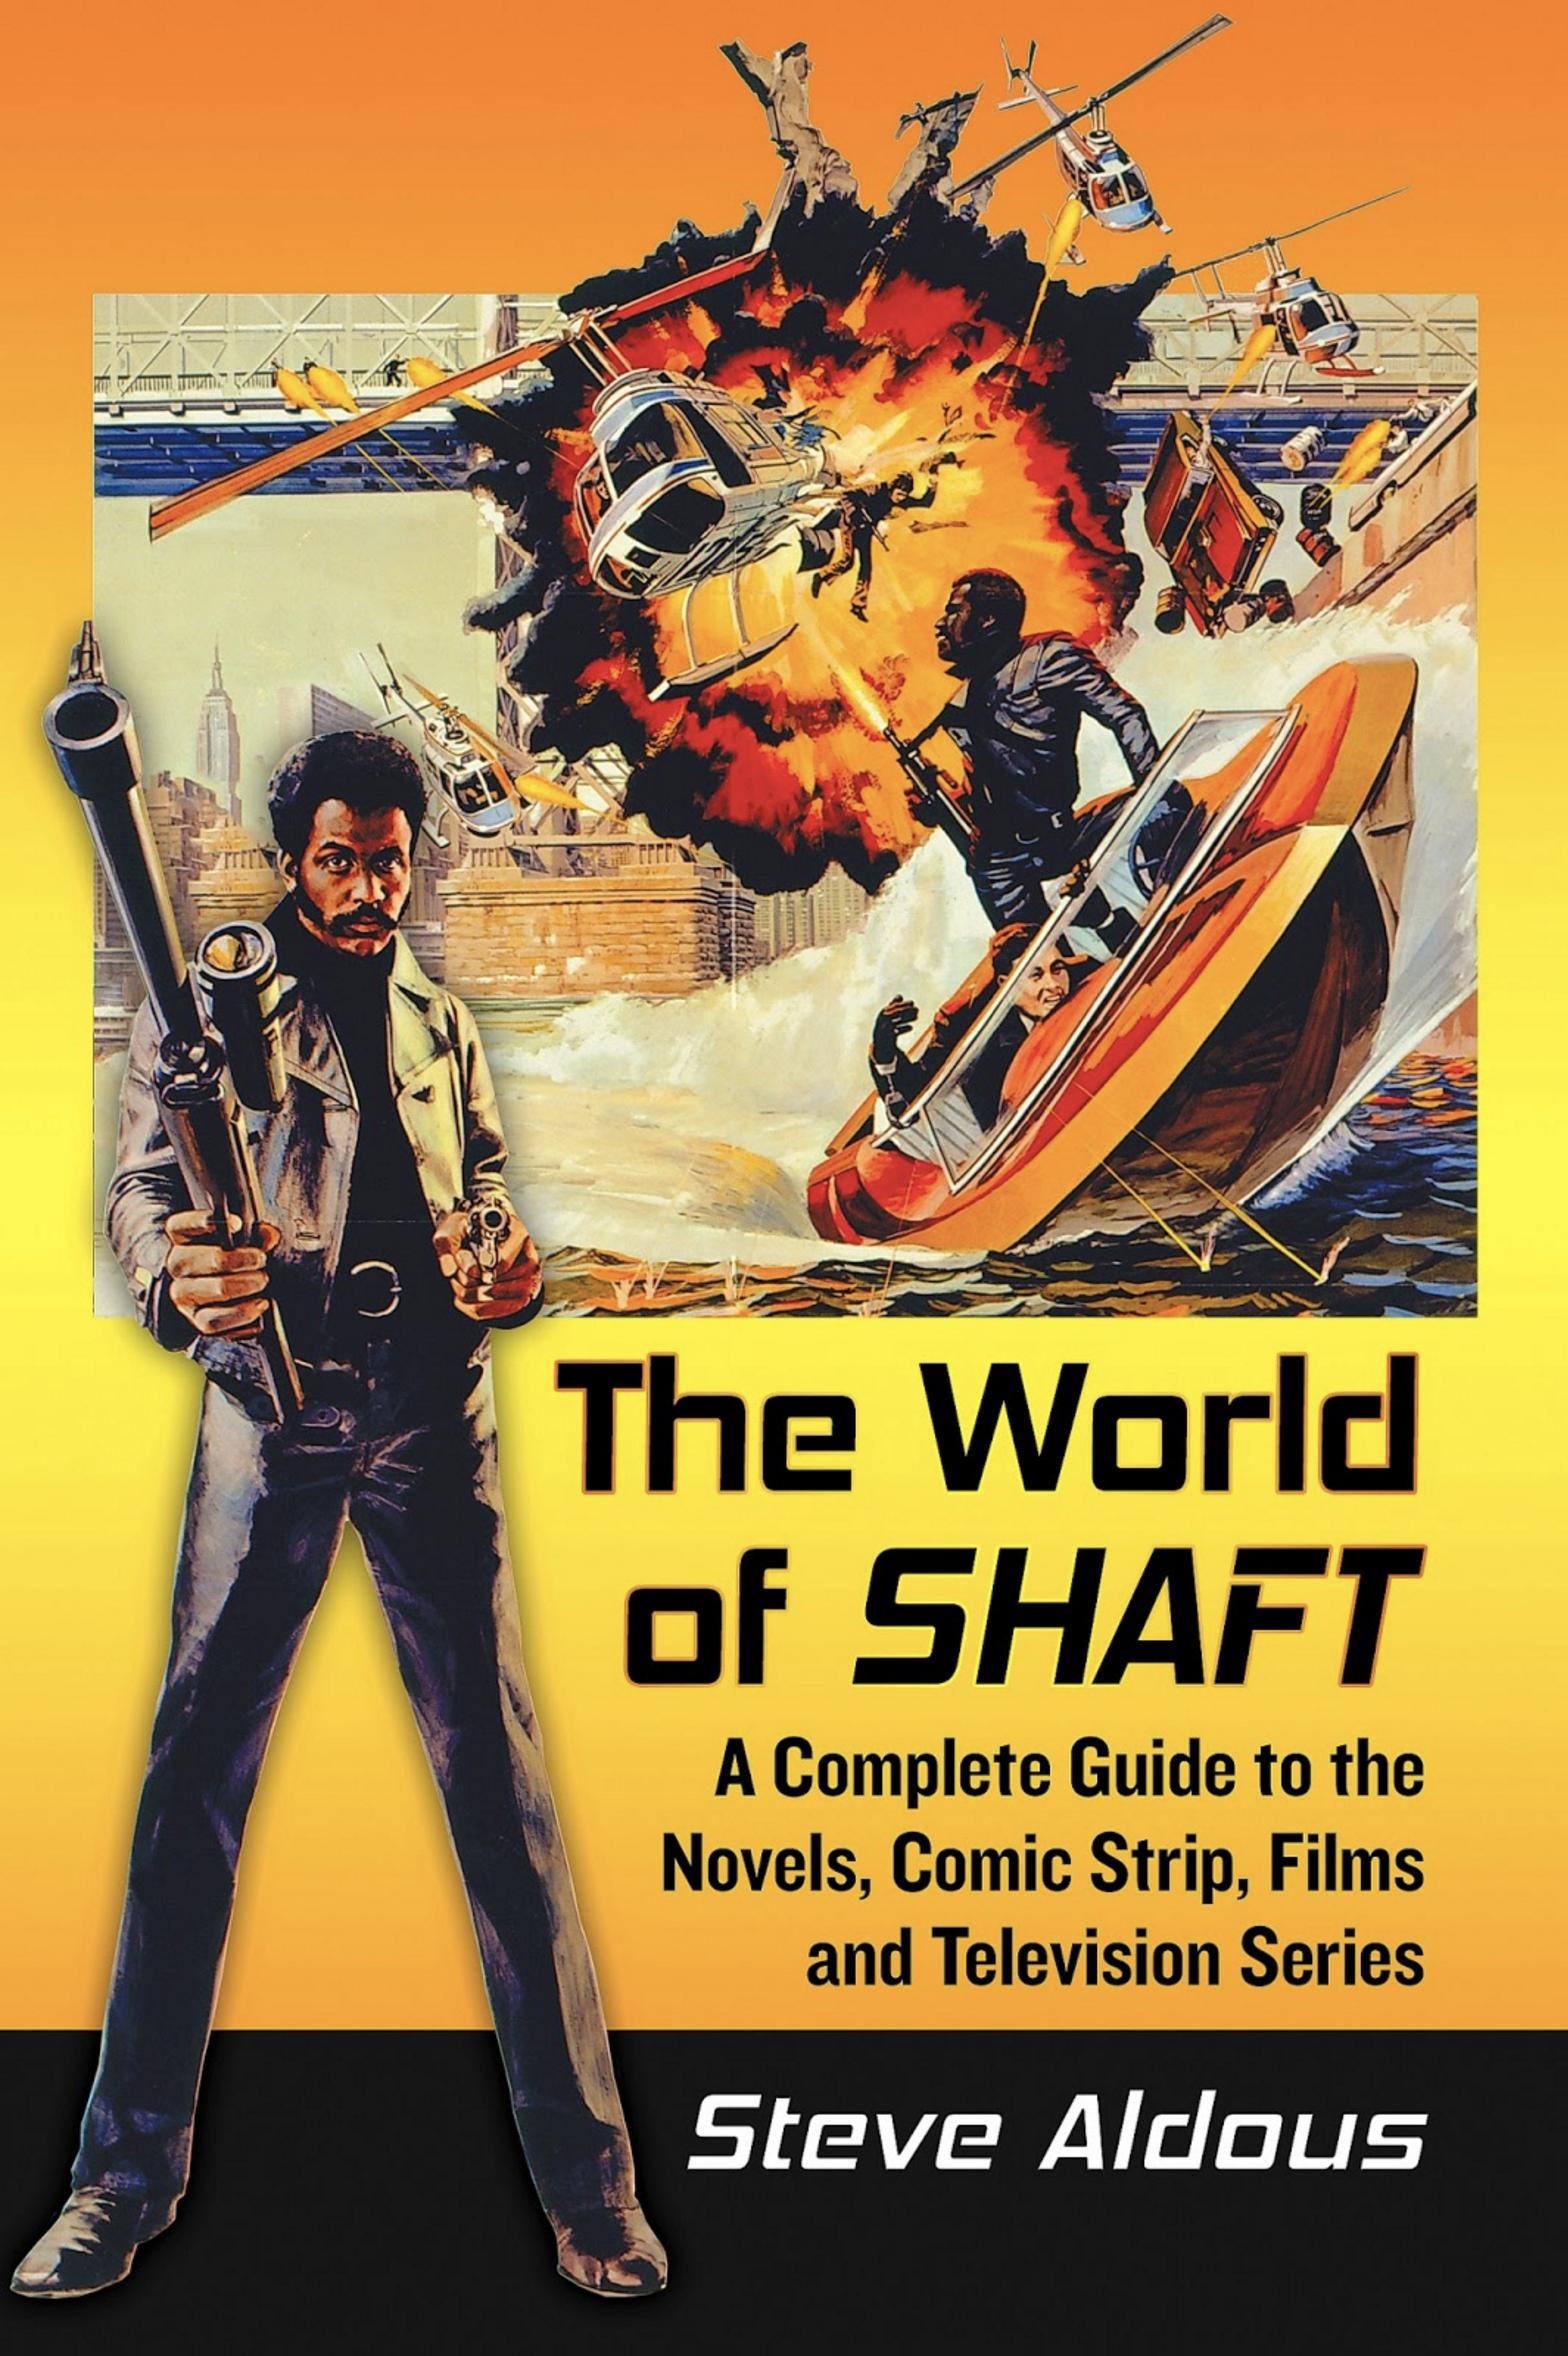 world-of-shaft